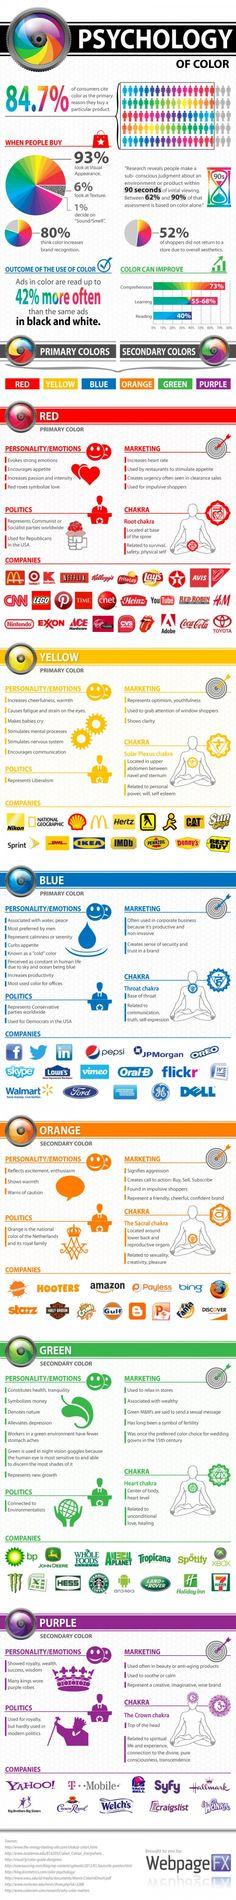 psychology-of-color-560x4510.jpg 560×4510 pikseliä